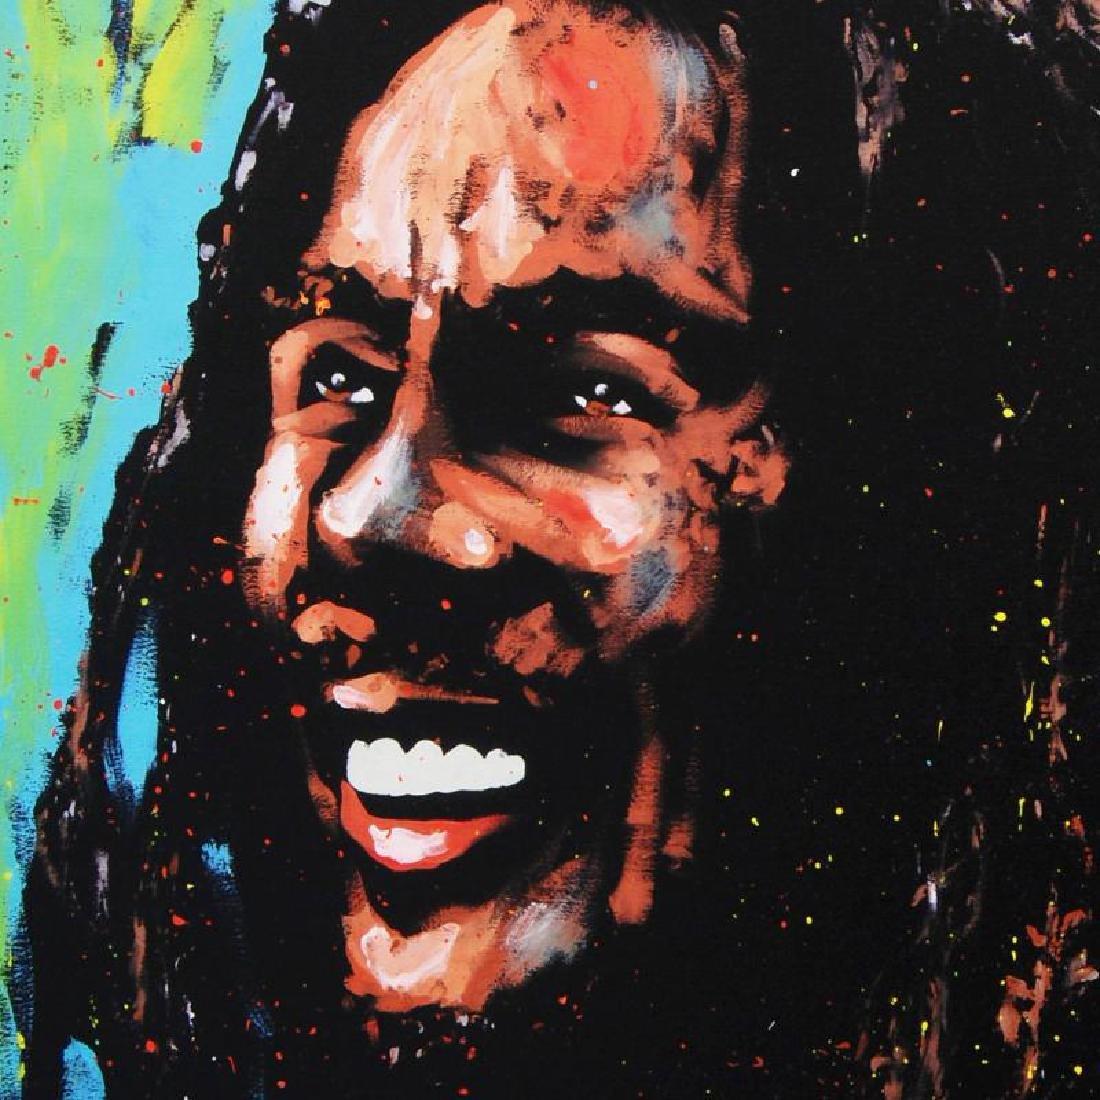 Bob Marley (Marley) by Garibaldi, David - 2